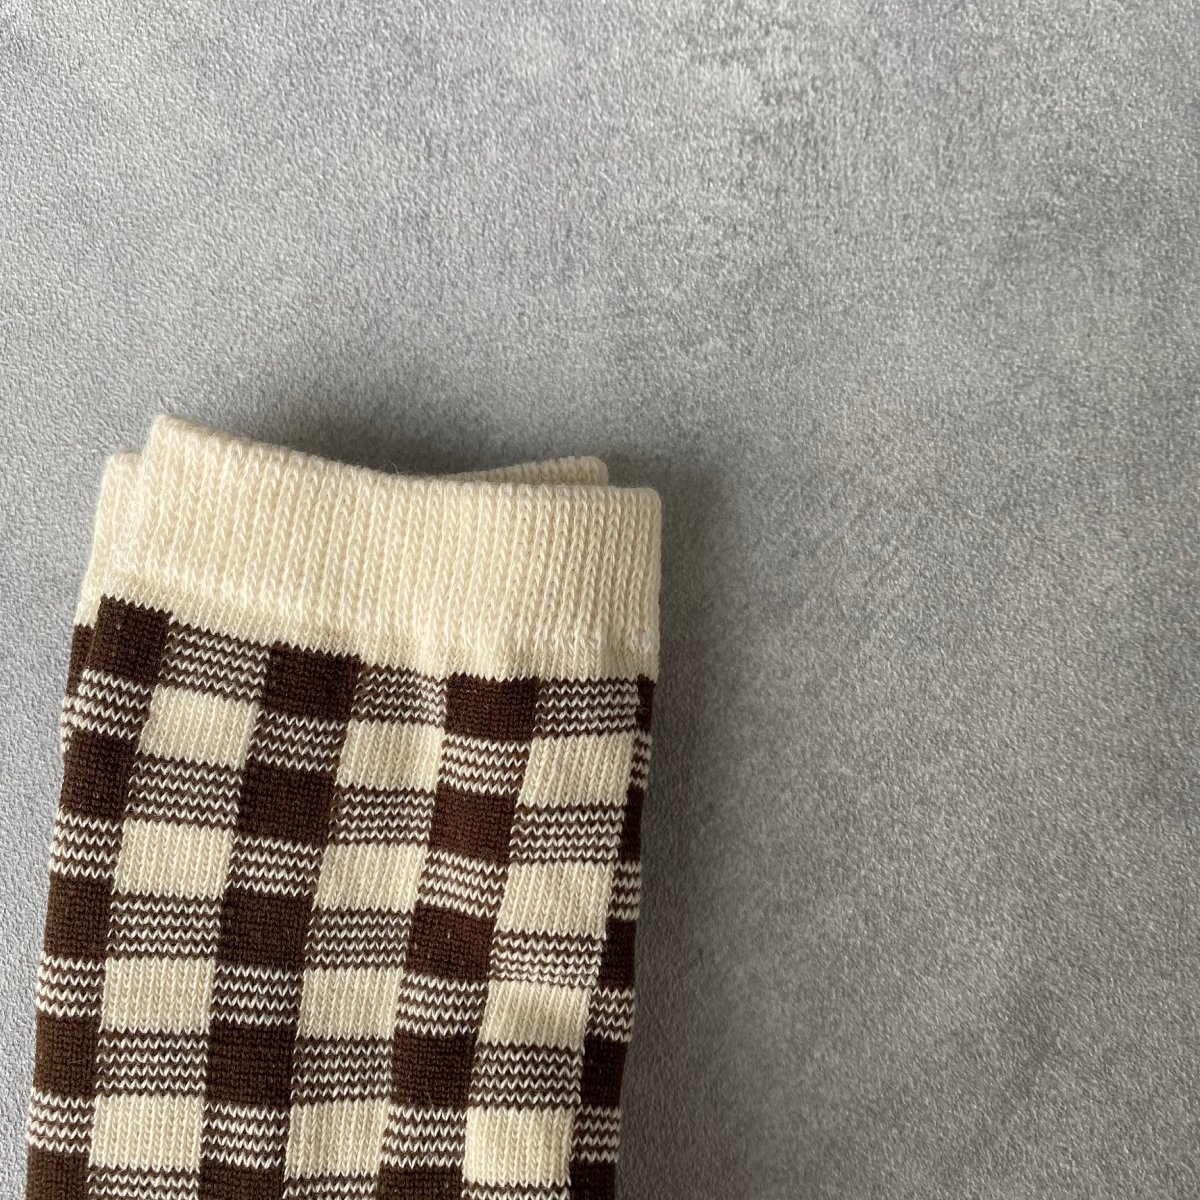 【KIDS】Natural Check Socks 詳細画像16